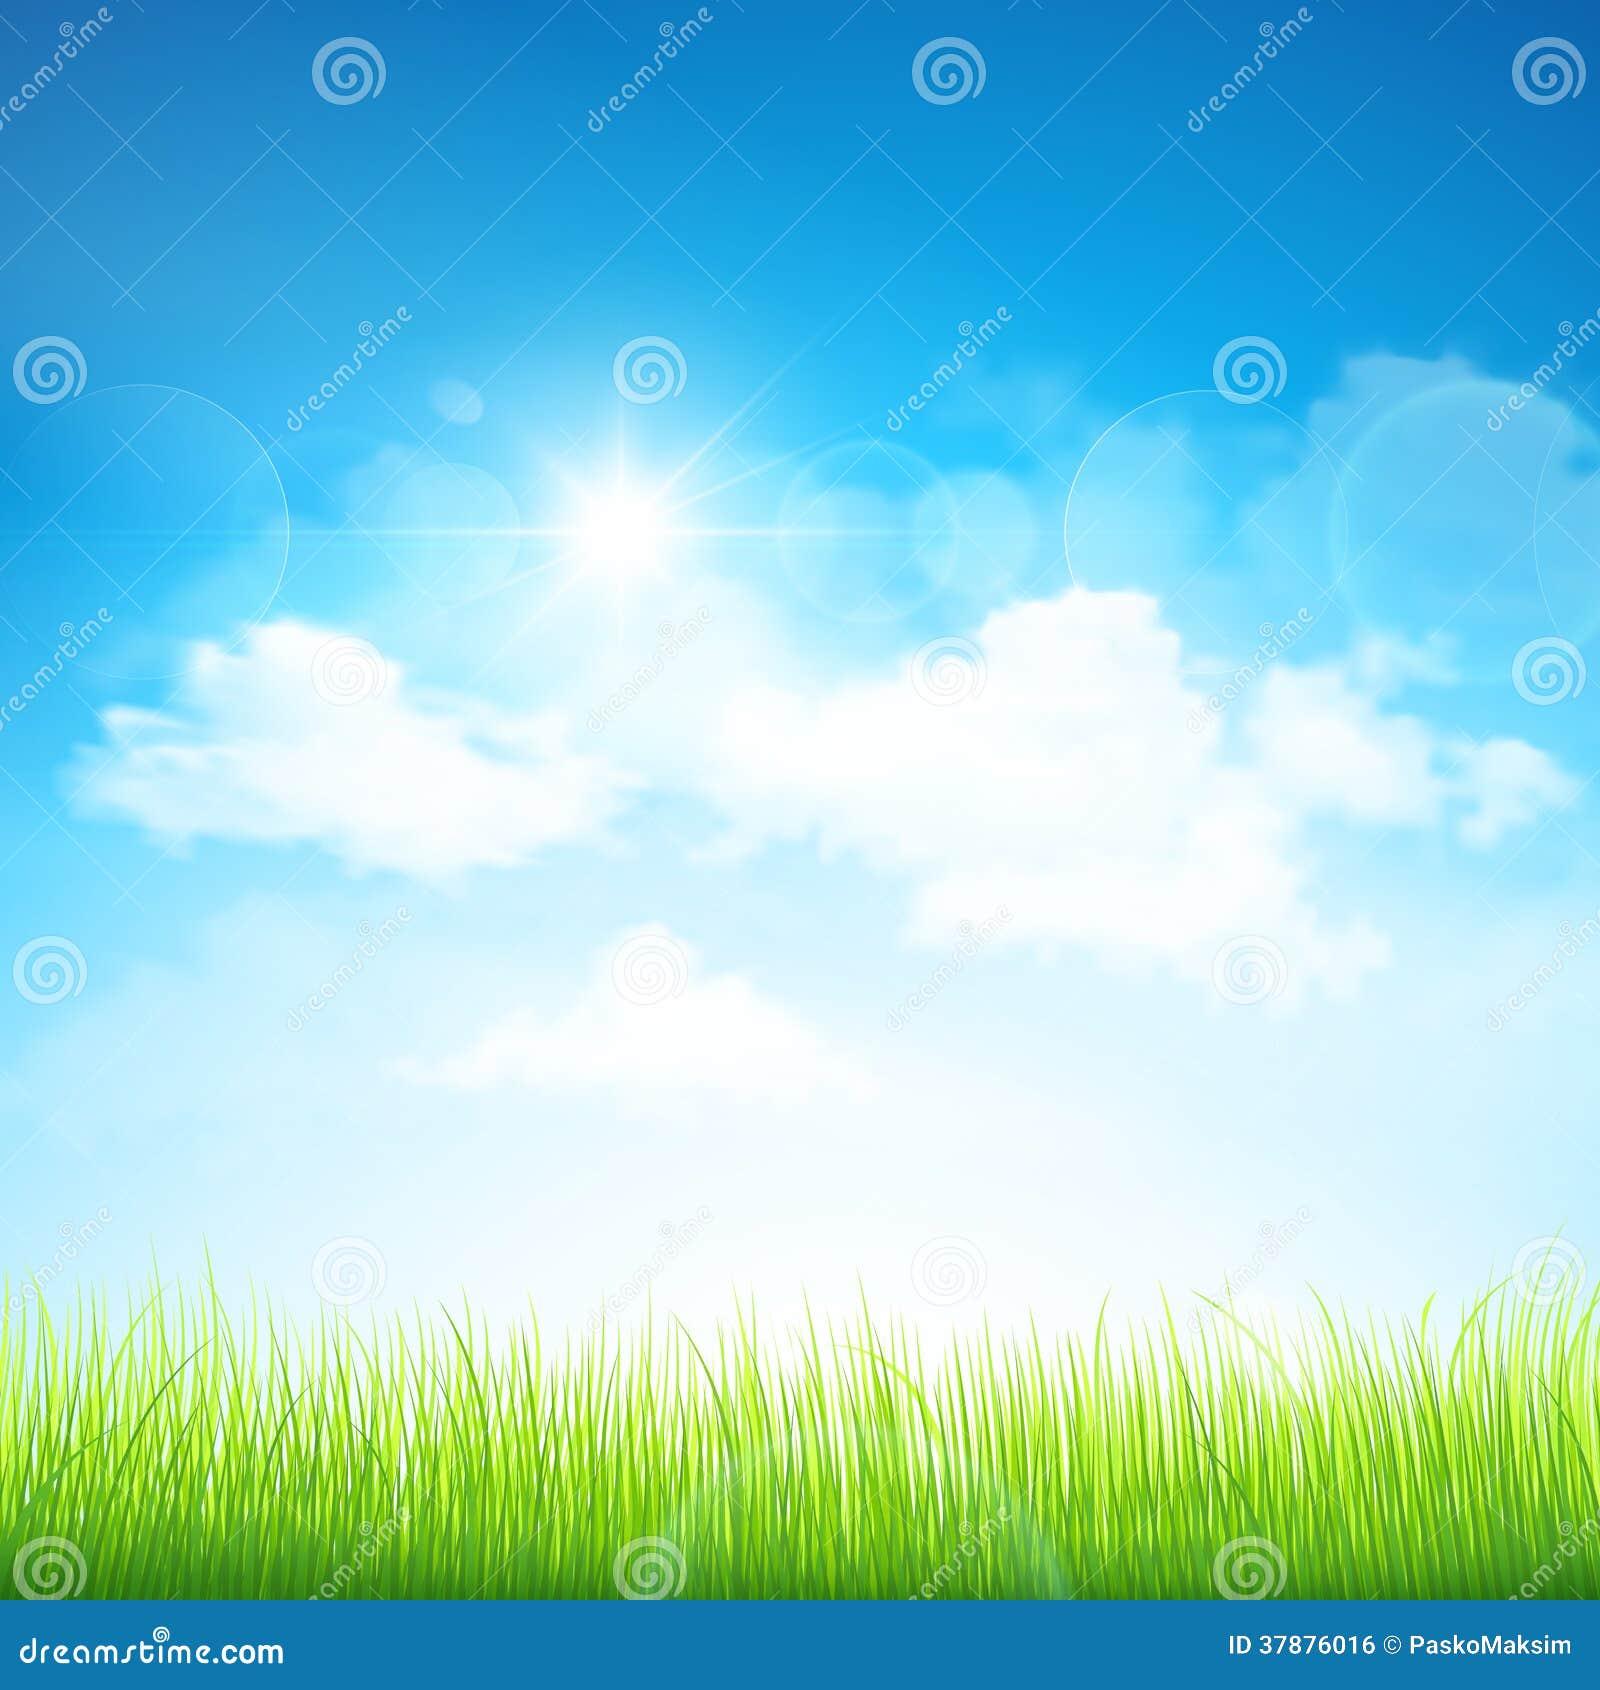 Groen gras en blauwe hemel